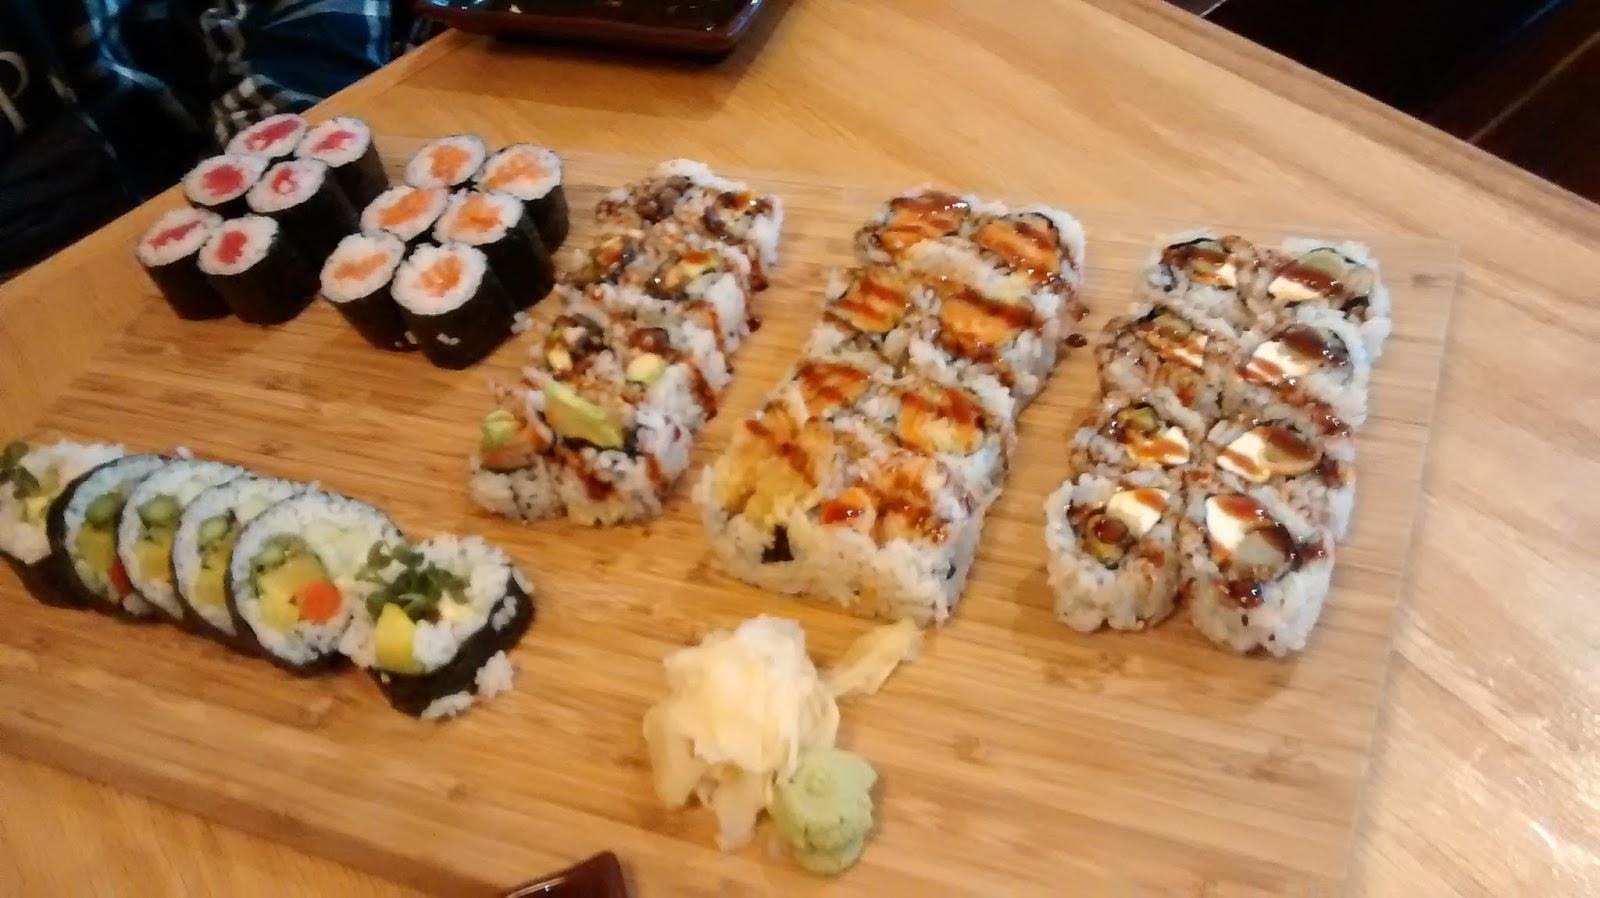 Sushi Station Webster Groves Visited November 2015 I like that it's in webster groves. st louis mid county restaurant reviews blogger